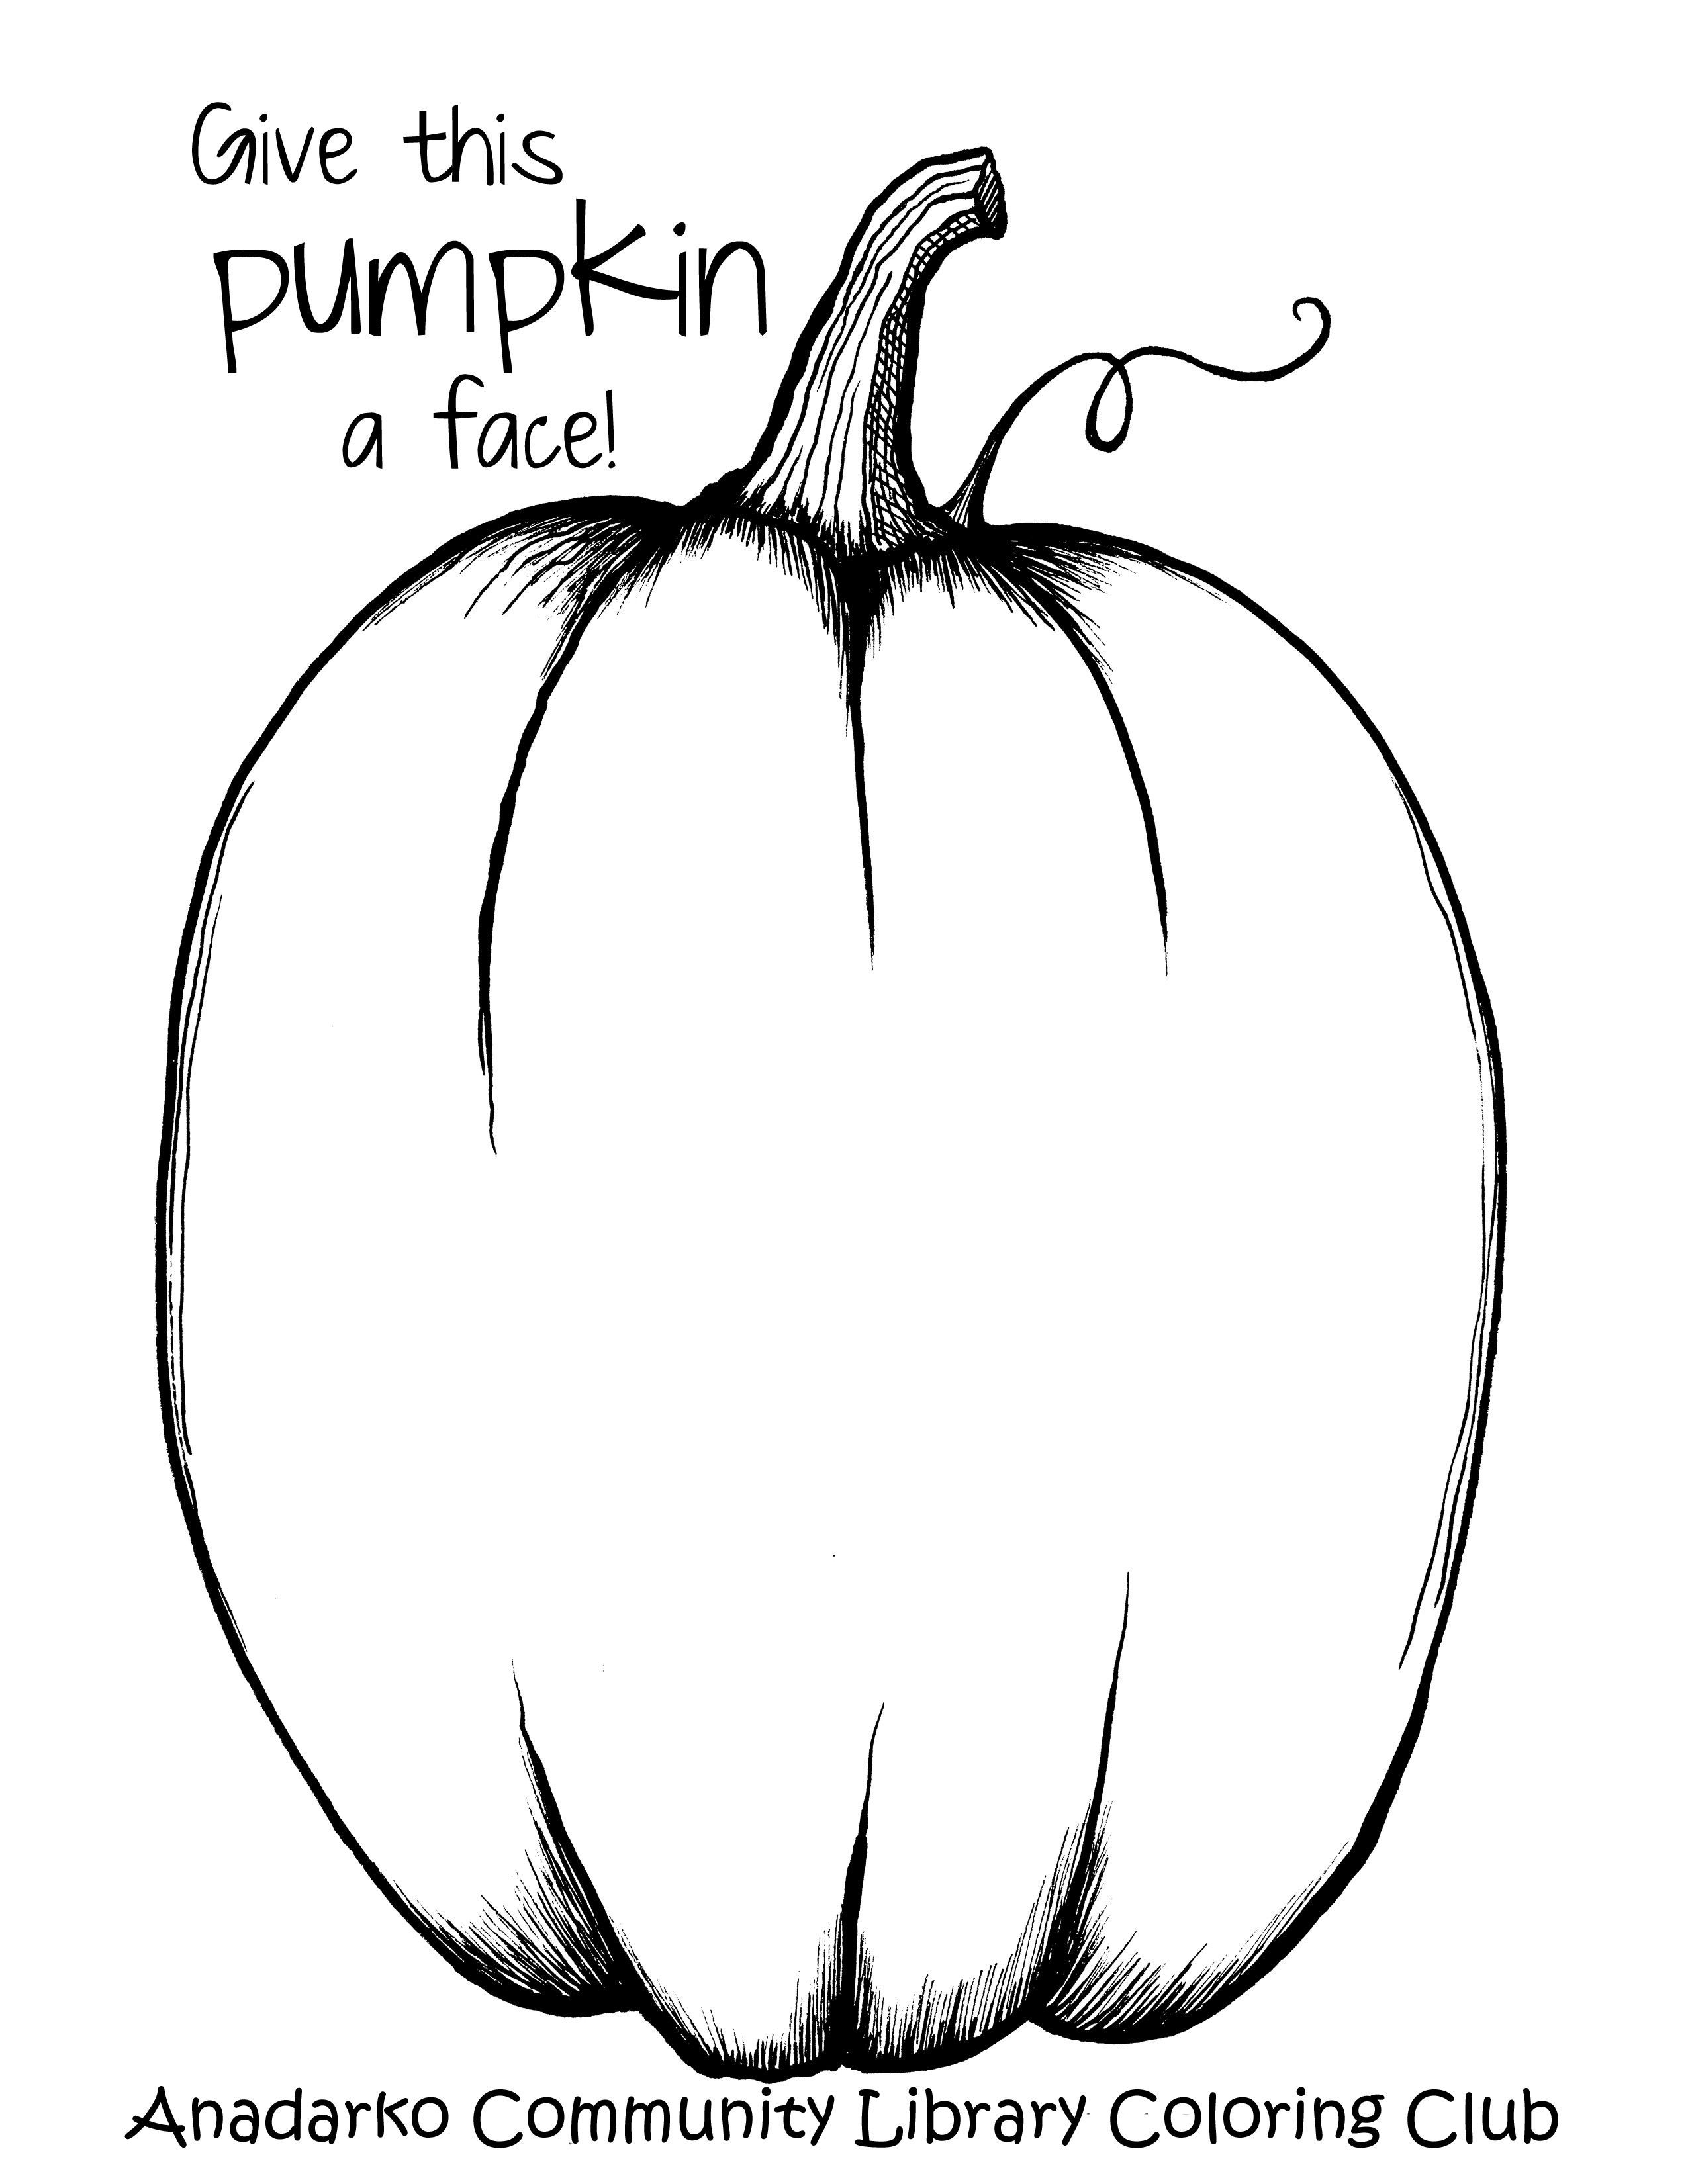 Custom Pumpkin Face Pumpkin Coloring Pages Halloween Coloring Pages Pumpkin Coloring Sheet